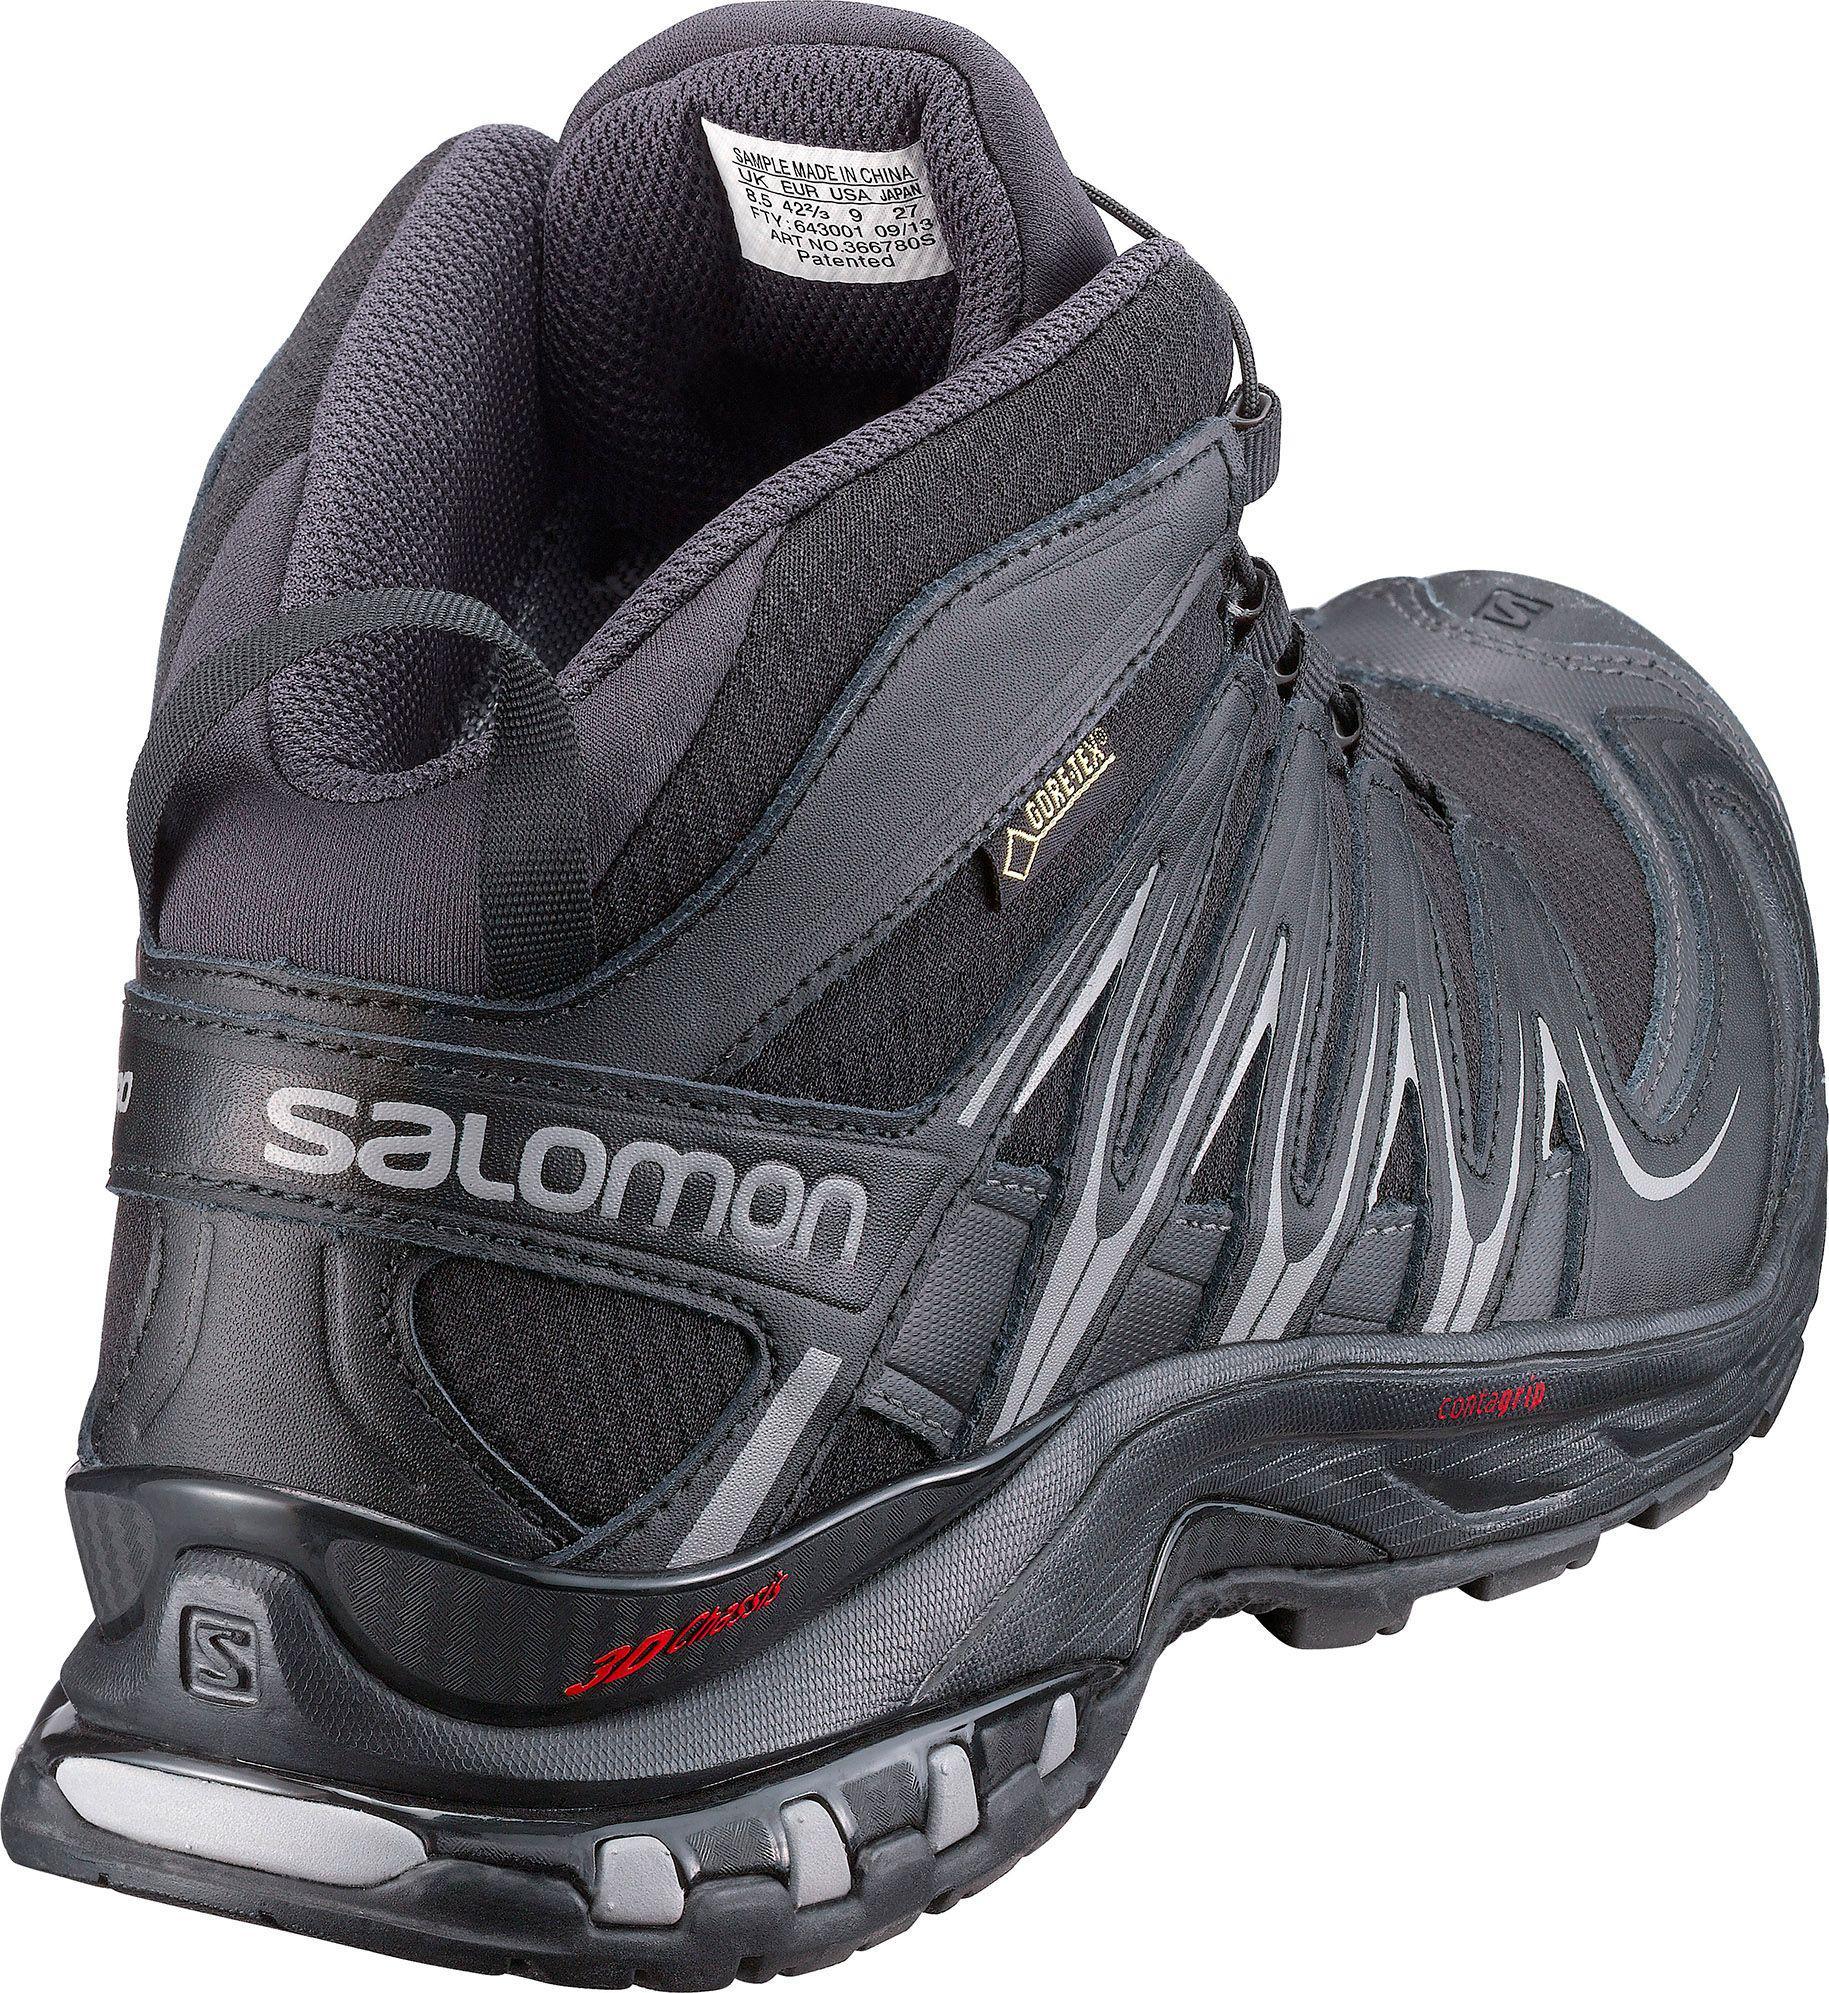 Pro Black Shoes For Mid Gore Tex Trail Salomon Men Xa Running Yves A54LRj